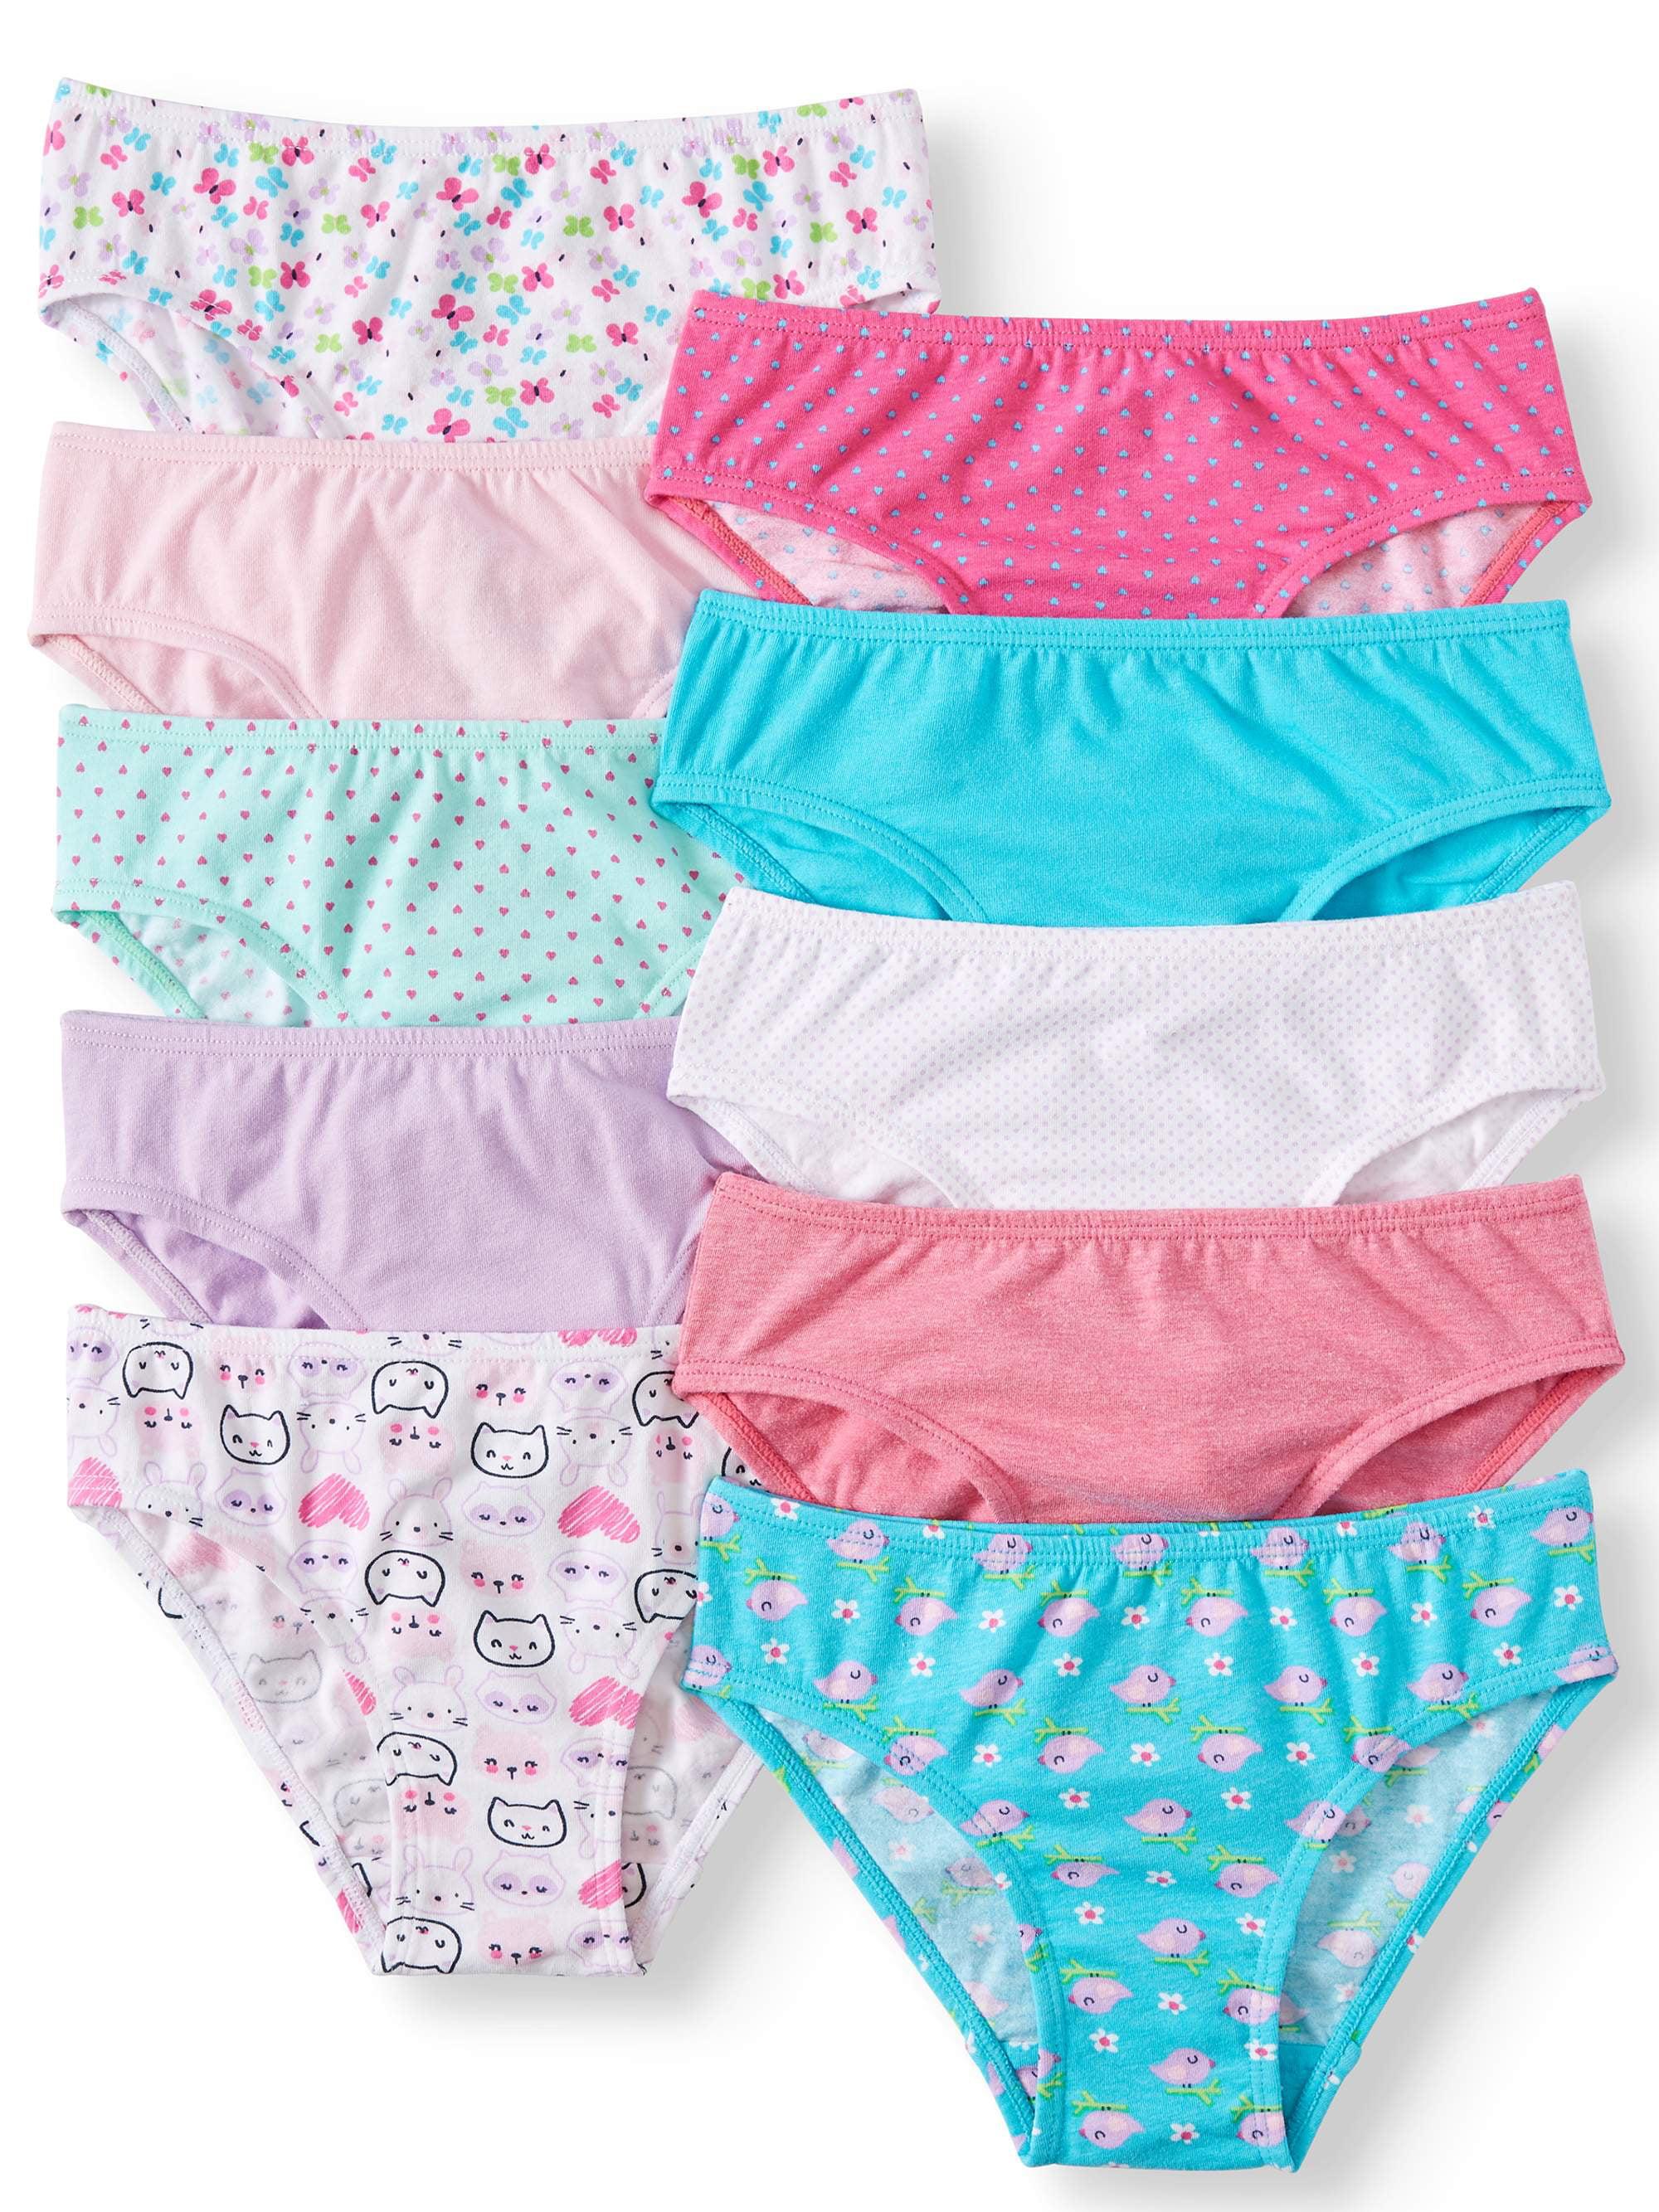 Fashion Cute Baby Girls Soft Cotton Underwear Panties Kids Underpants Cloth neQP